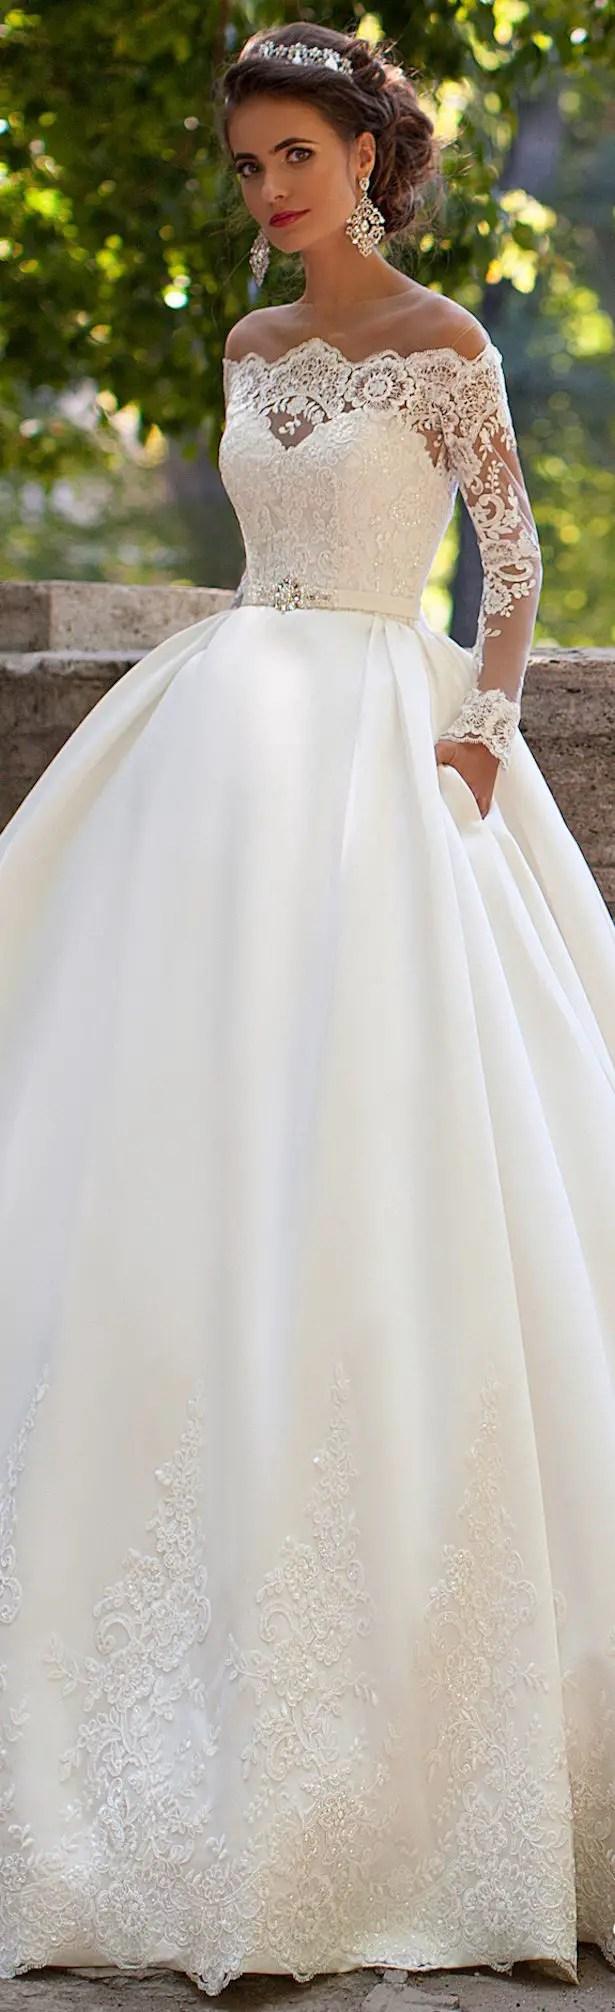 best wedding dresses of